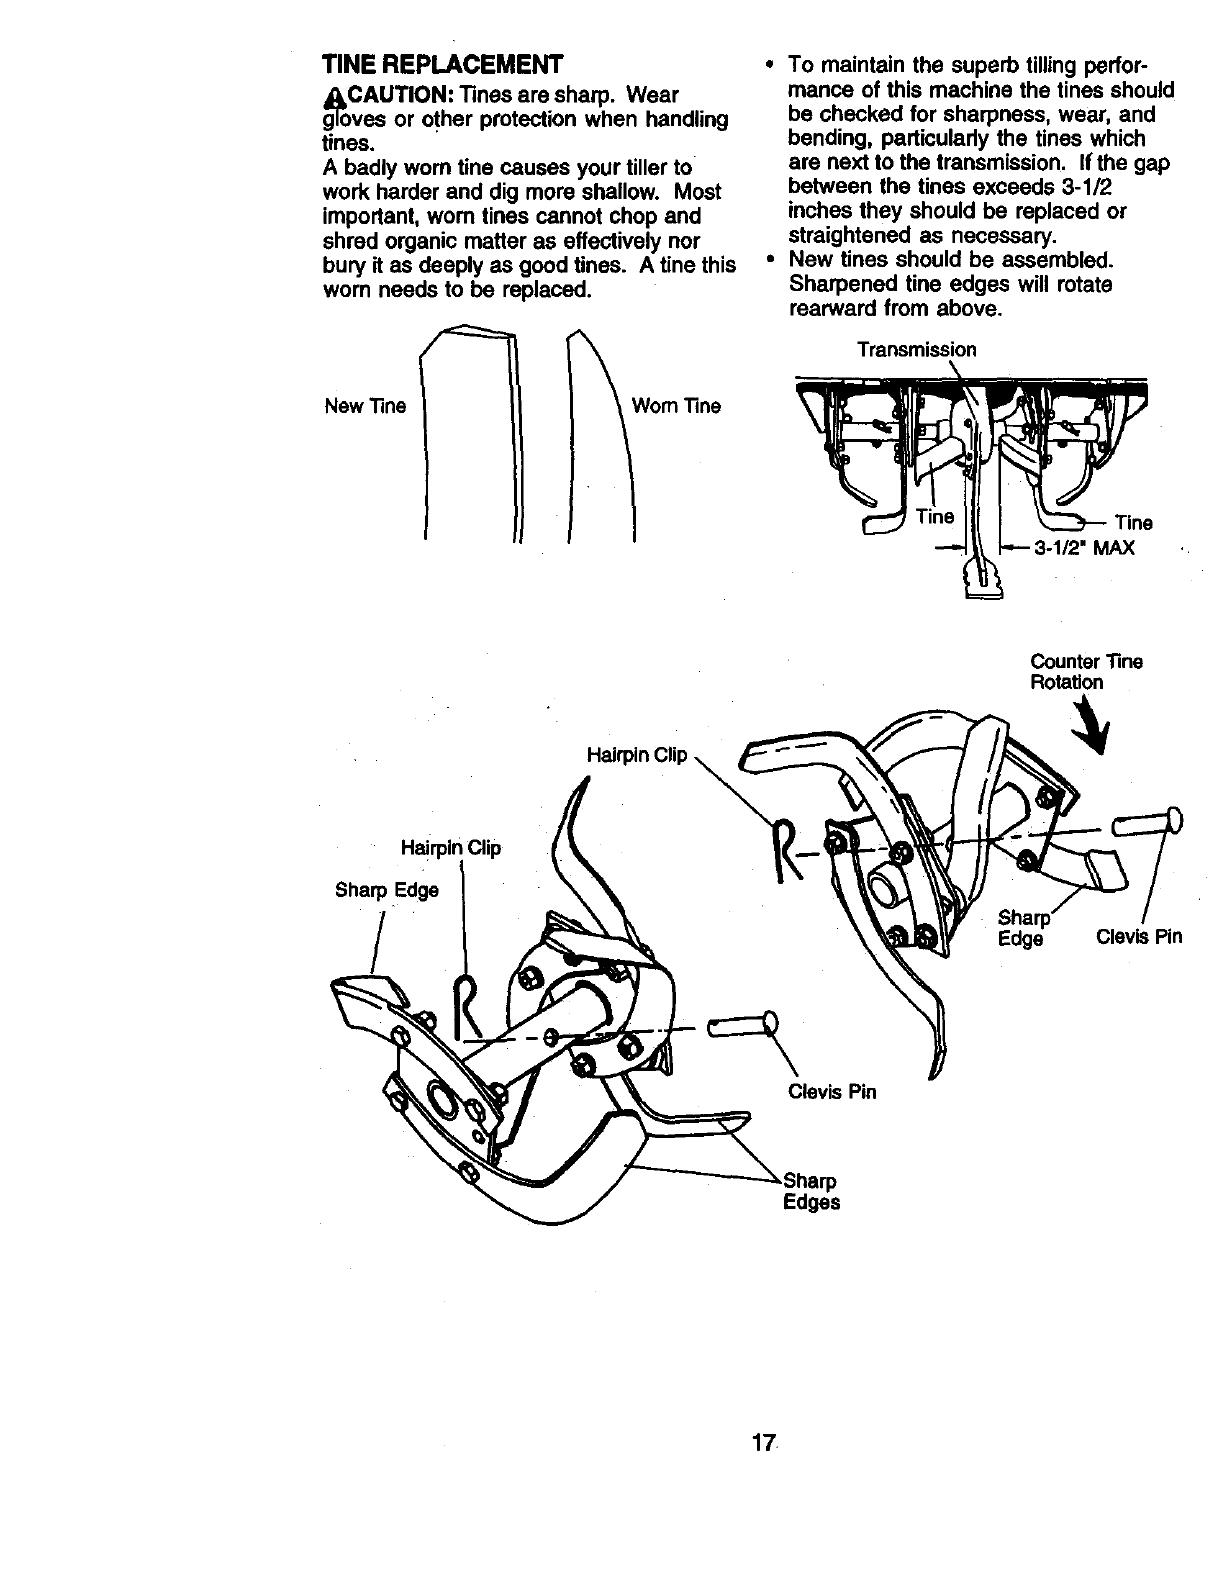 Craftsman 917293340 User Manual 9.0HP REAR TINE TILLER